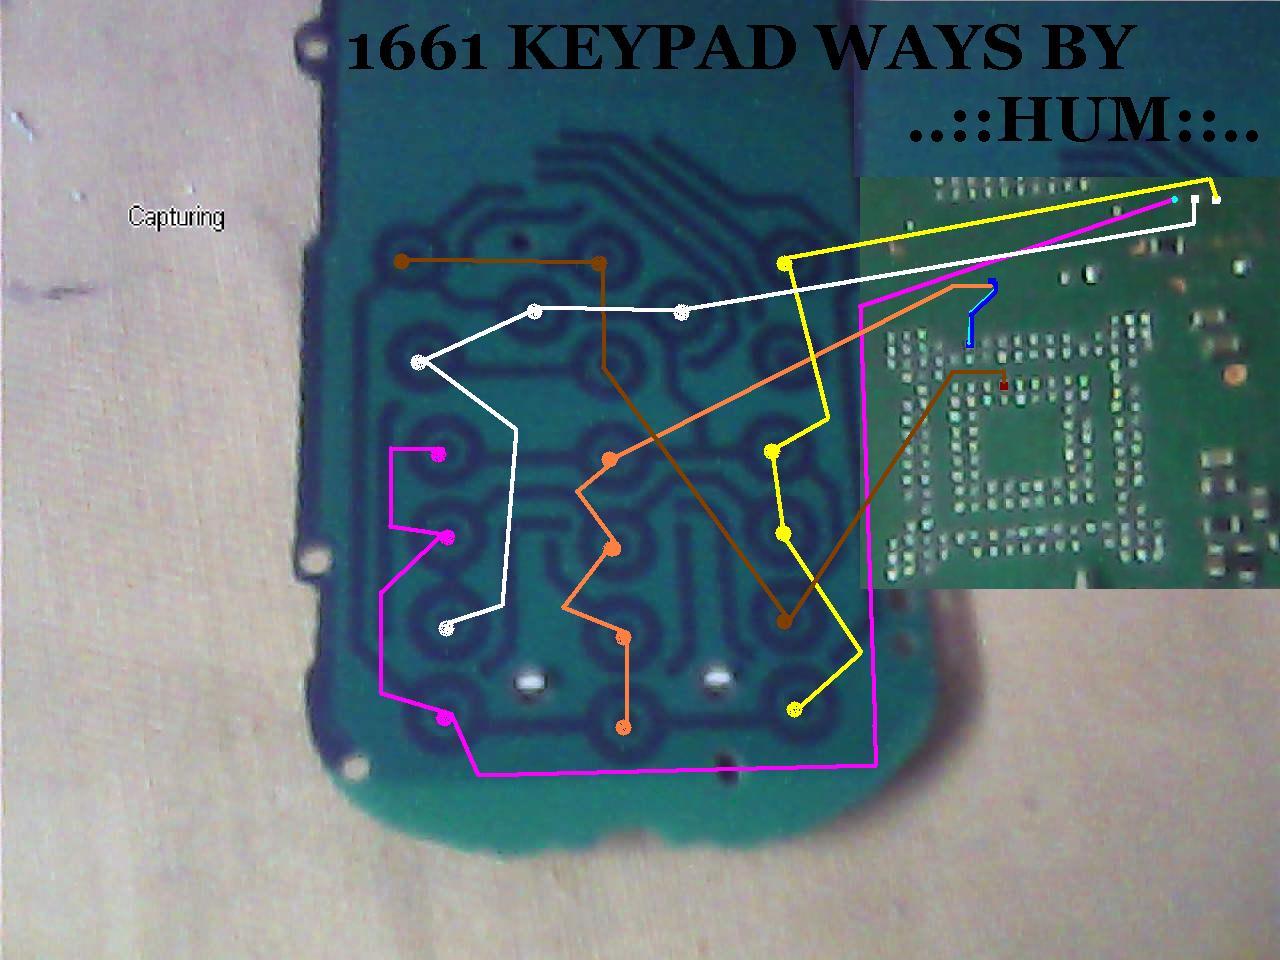 http://1.bp.blogspot.com/-ch_KR8Oihfk/TyUMiJYxpuI/AAAAAAAAAFM/0DuSwL91BKo/s1600/1661keypadways.jpg